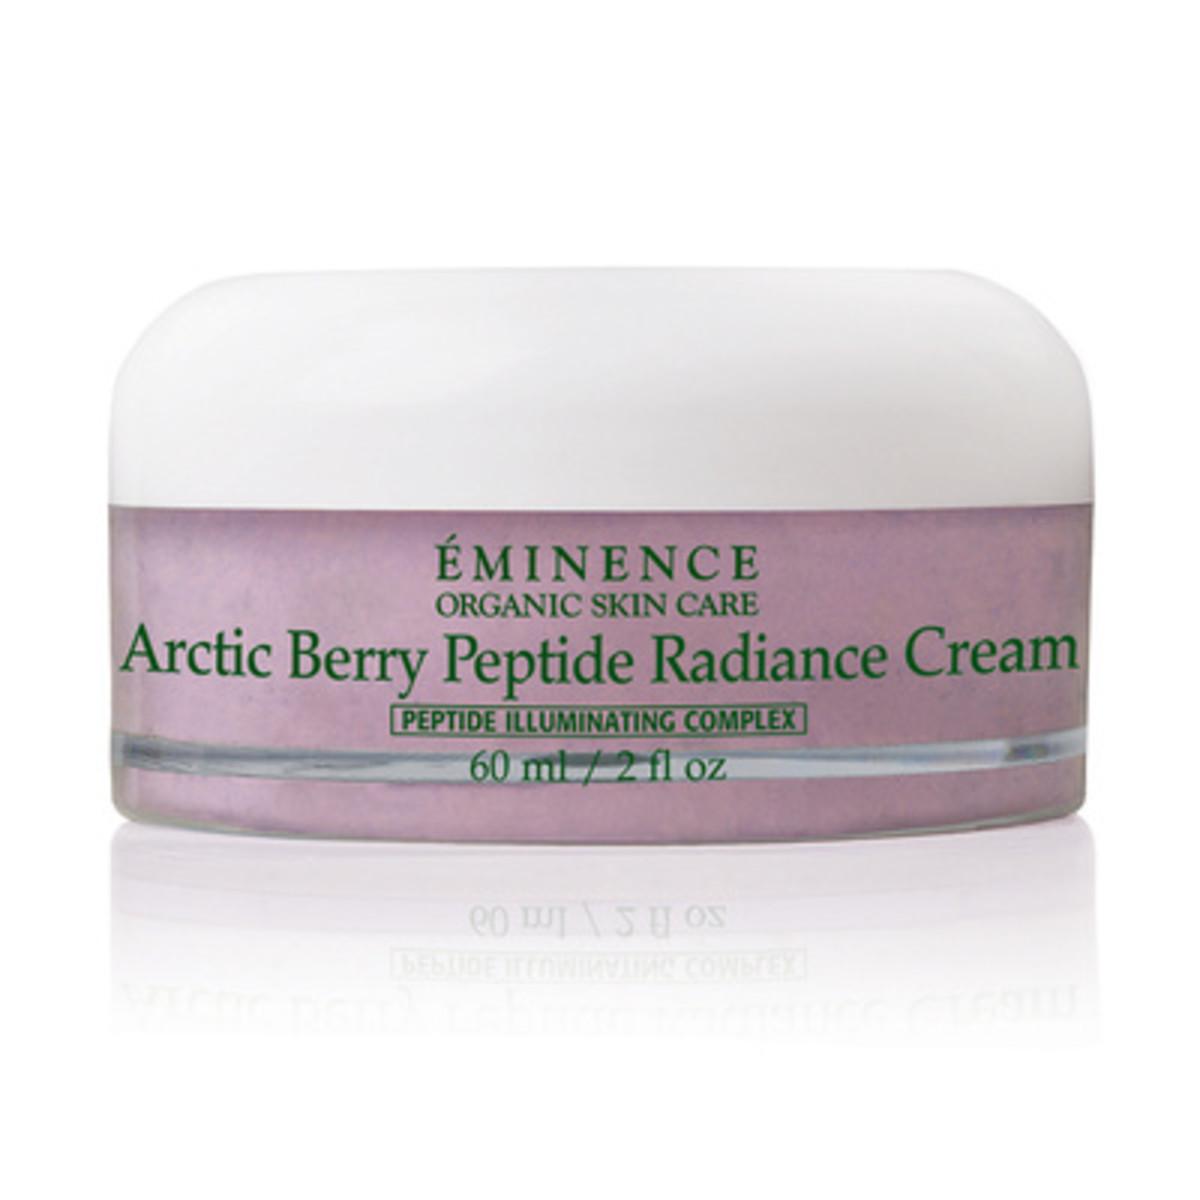 Eminence Organics Arctic Berry Peptide Radiance Cream